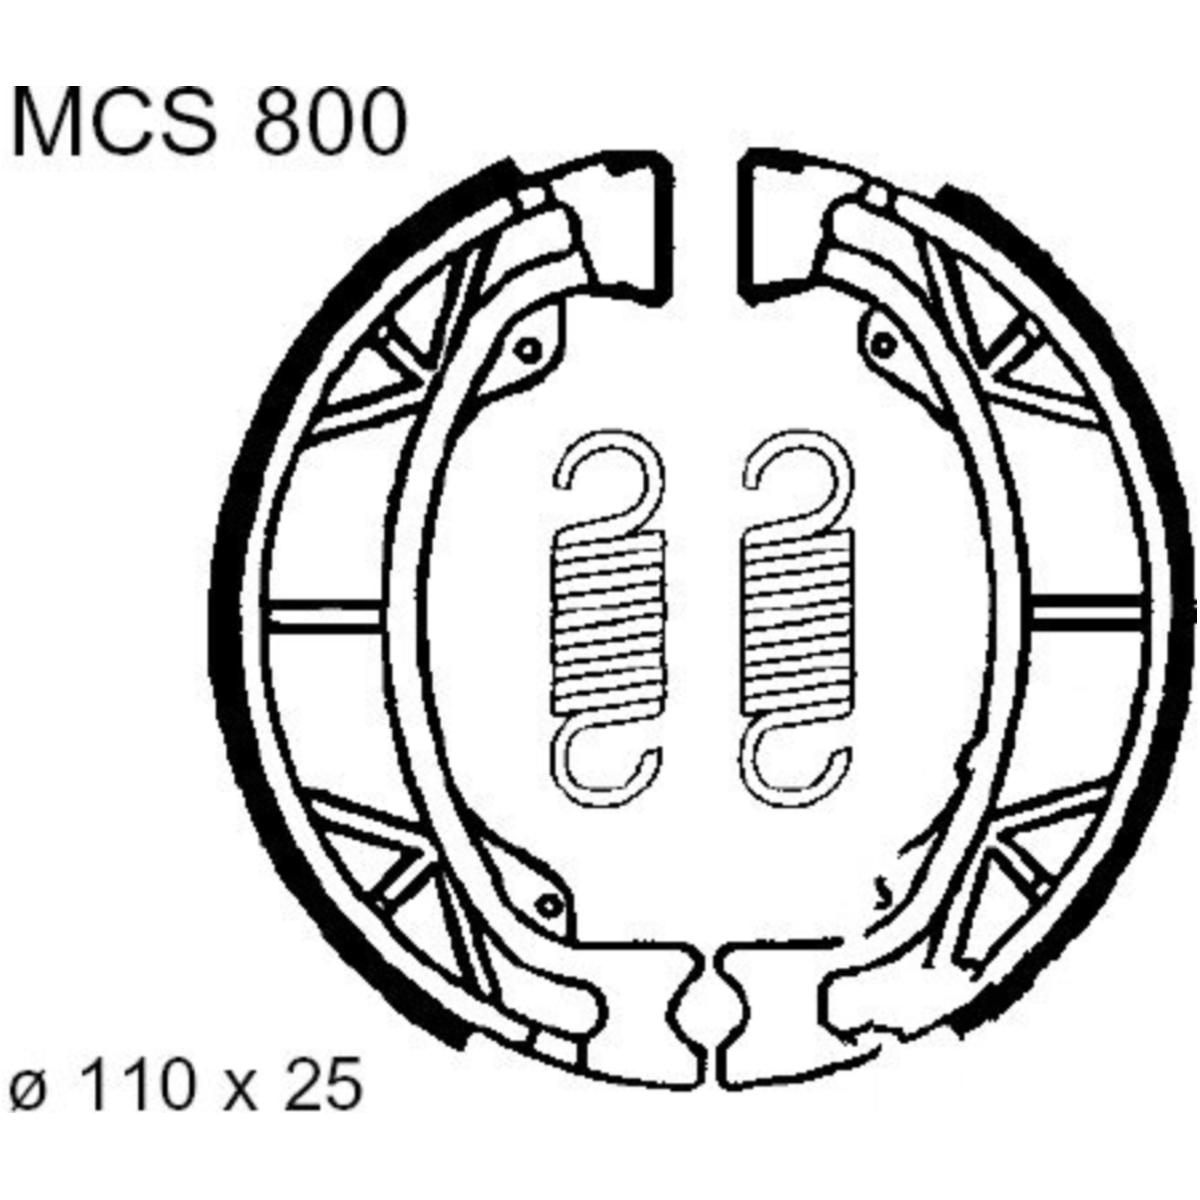 Peugeot Buxy Wiring Diagram Data Xps Brake Shoes Inc Springs Trw Mcs800 19493 Rh Biketeile Service De Cinema